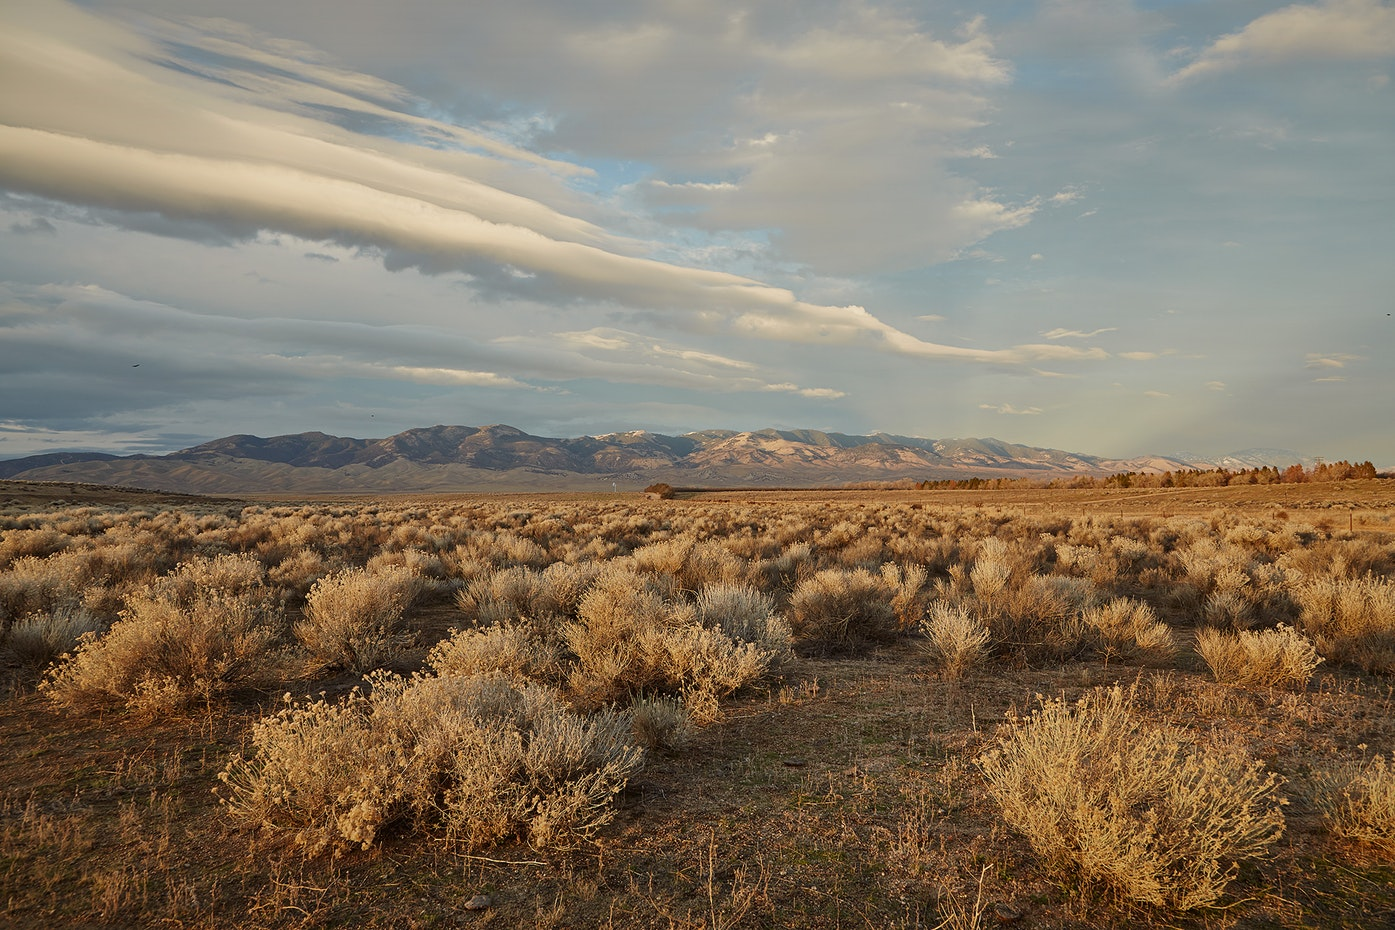 9158_erik-almas-photographer-_tejon_ranch_sunset_a2_1012_wip_2_final